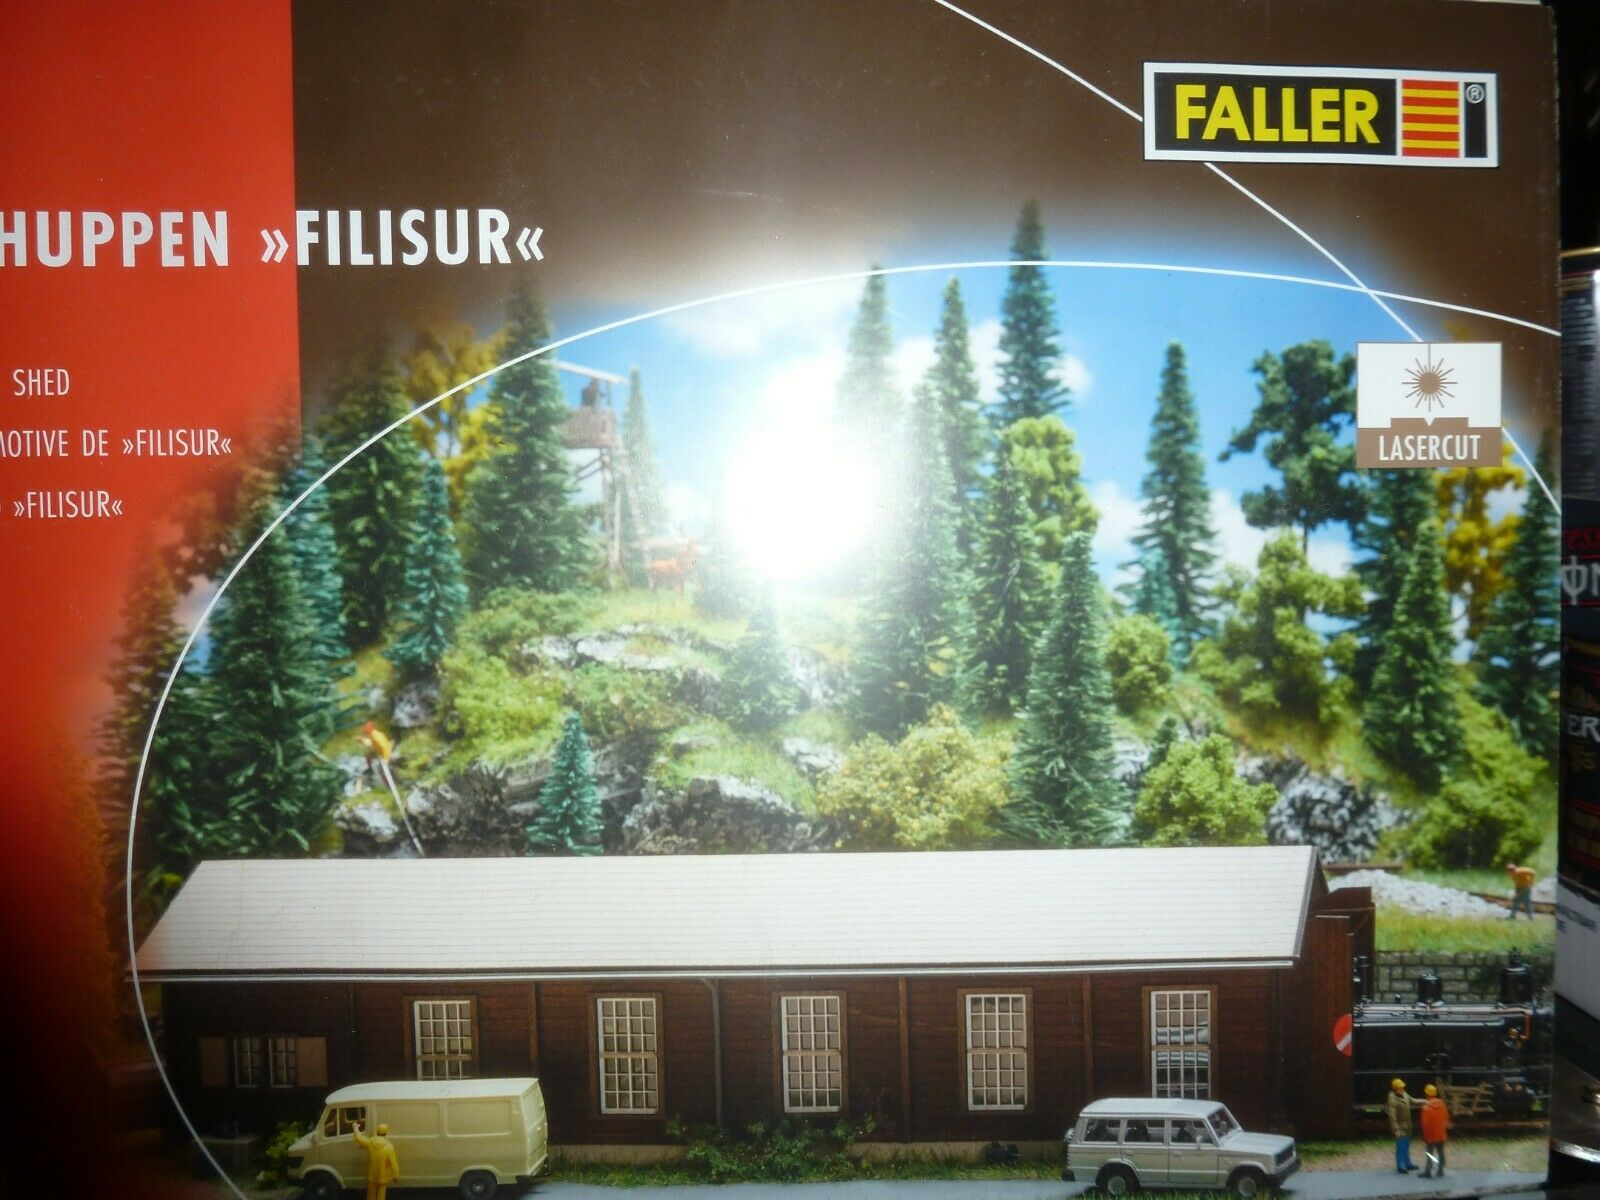 Ftuttier Lokschuppen Filisur n. 120279 LASERCUT Spur HO